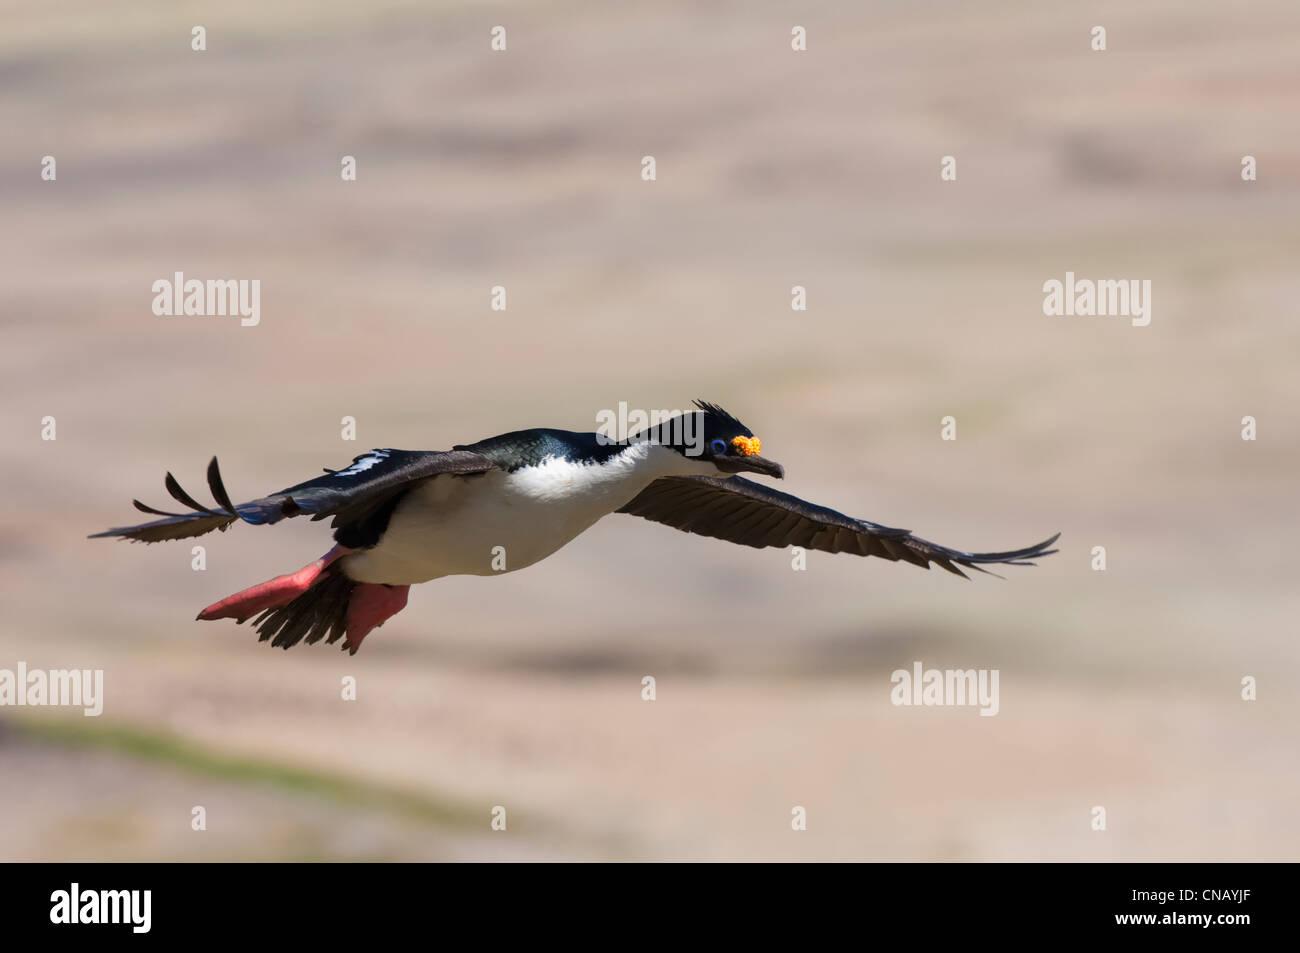 Imperial Shag, formerly Blue-eyed or King Cormorant, (Phalacrocorax atriceps) in flight, Saunders Island, Falkland - Stock Image